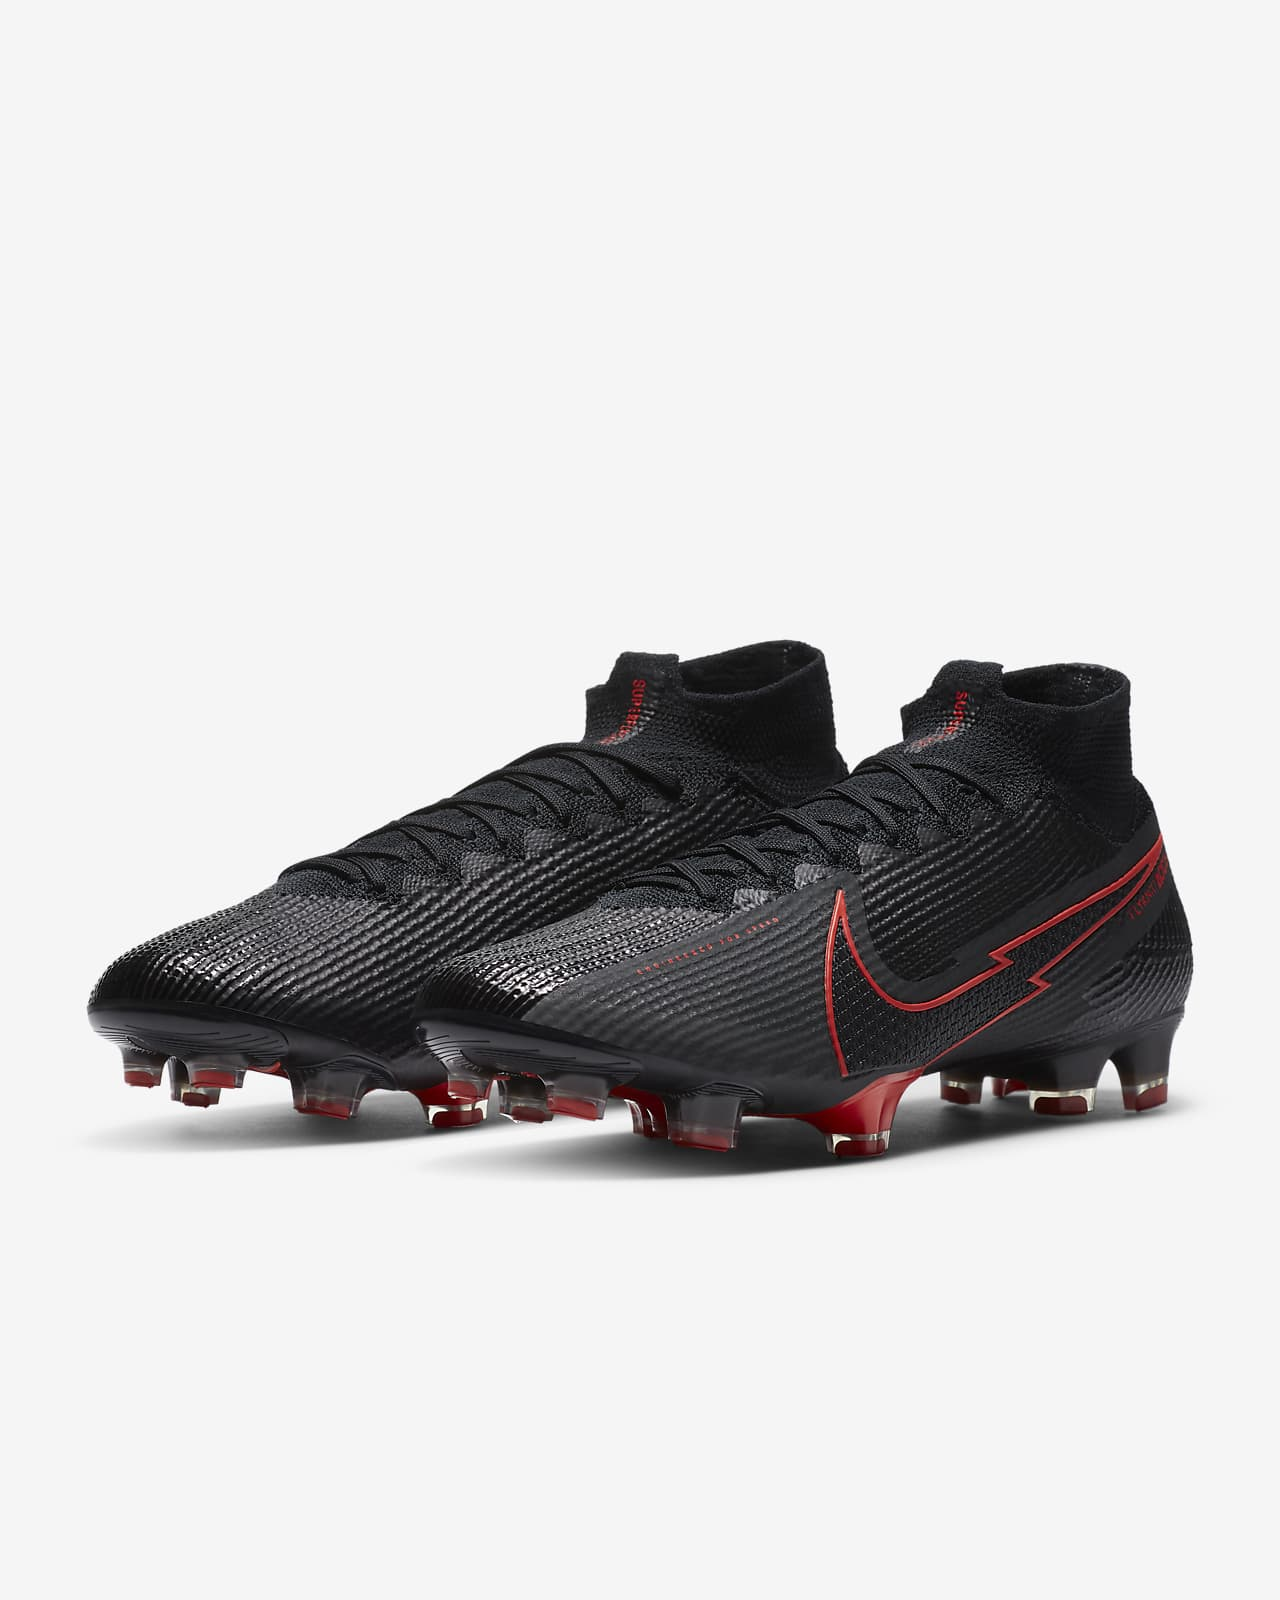 Intentar Hacer las tareas domésticas Misericordioso  Nike Mercurial Superfly 7 Elite FG Firm-Ground Soccer Cleat. Nike.com